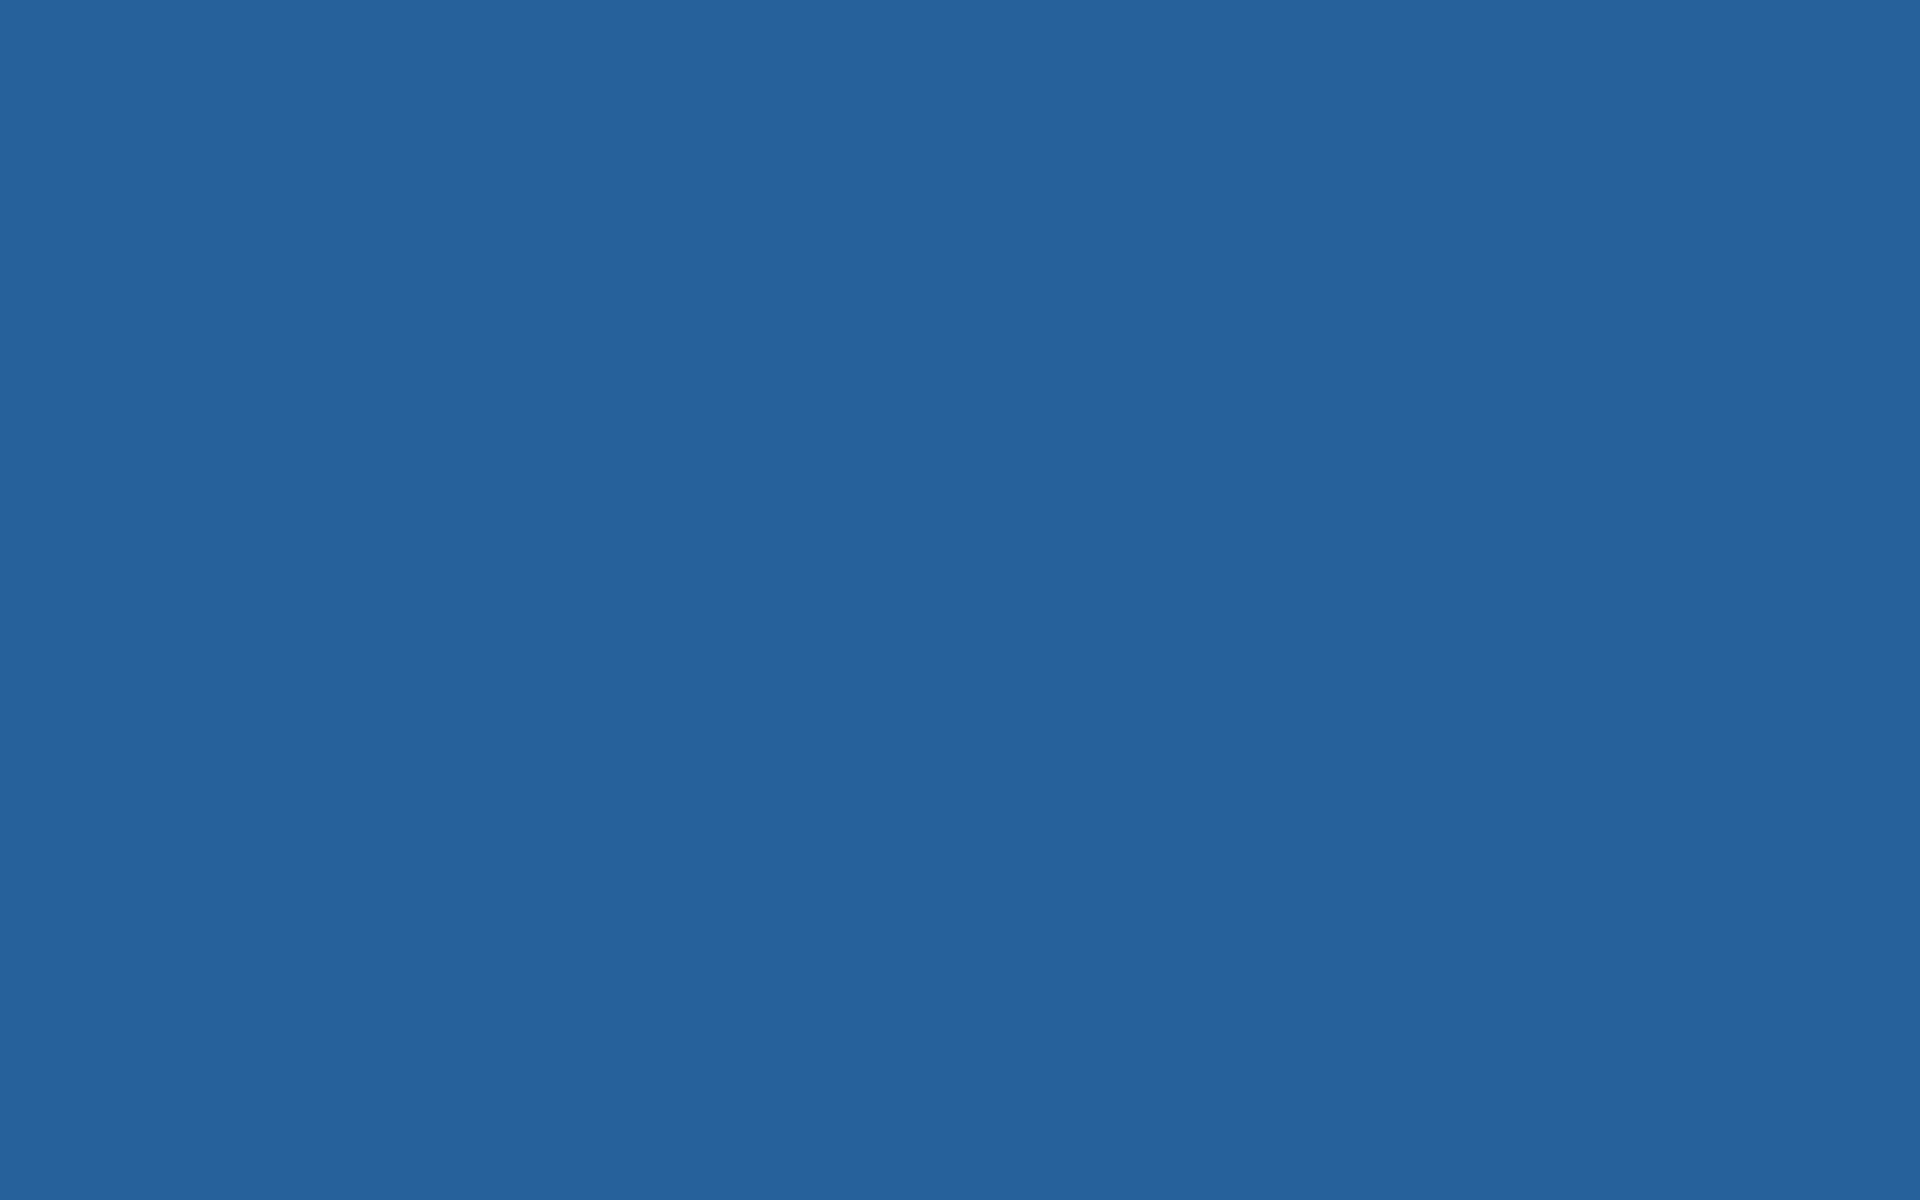 1920x1200 Lapis Lazuli Solid Color Background